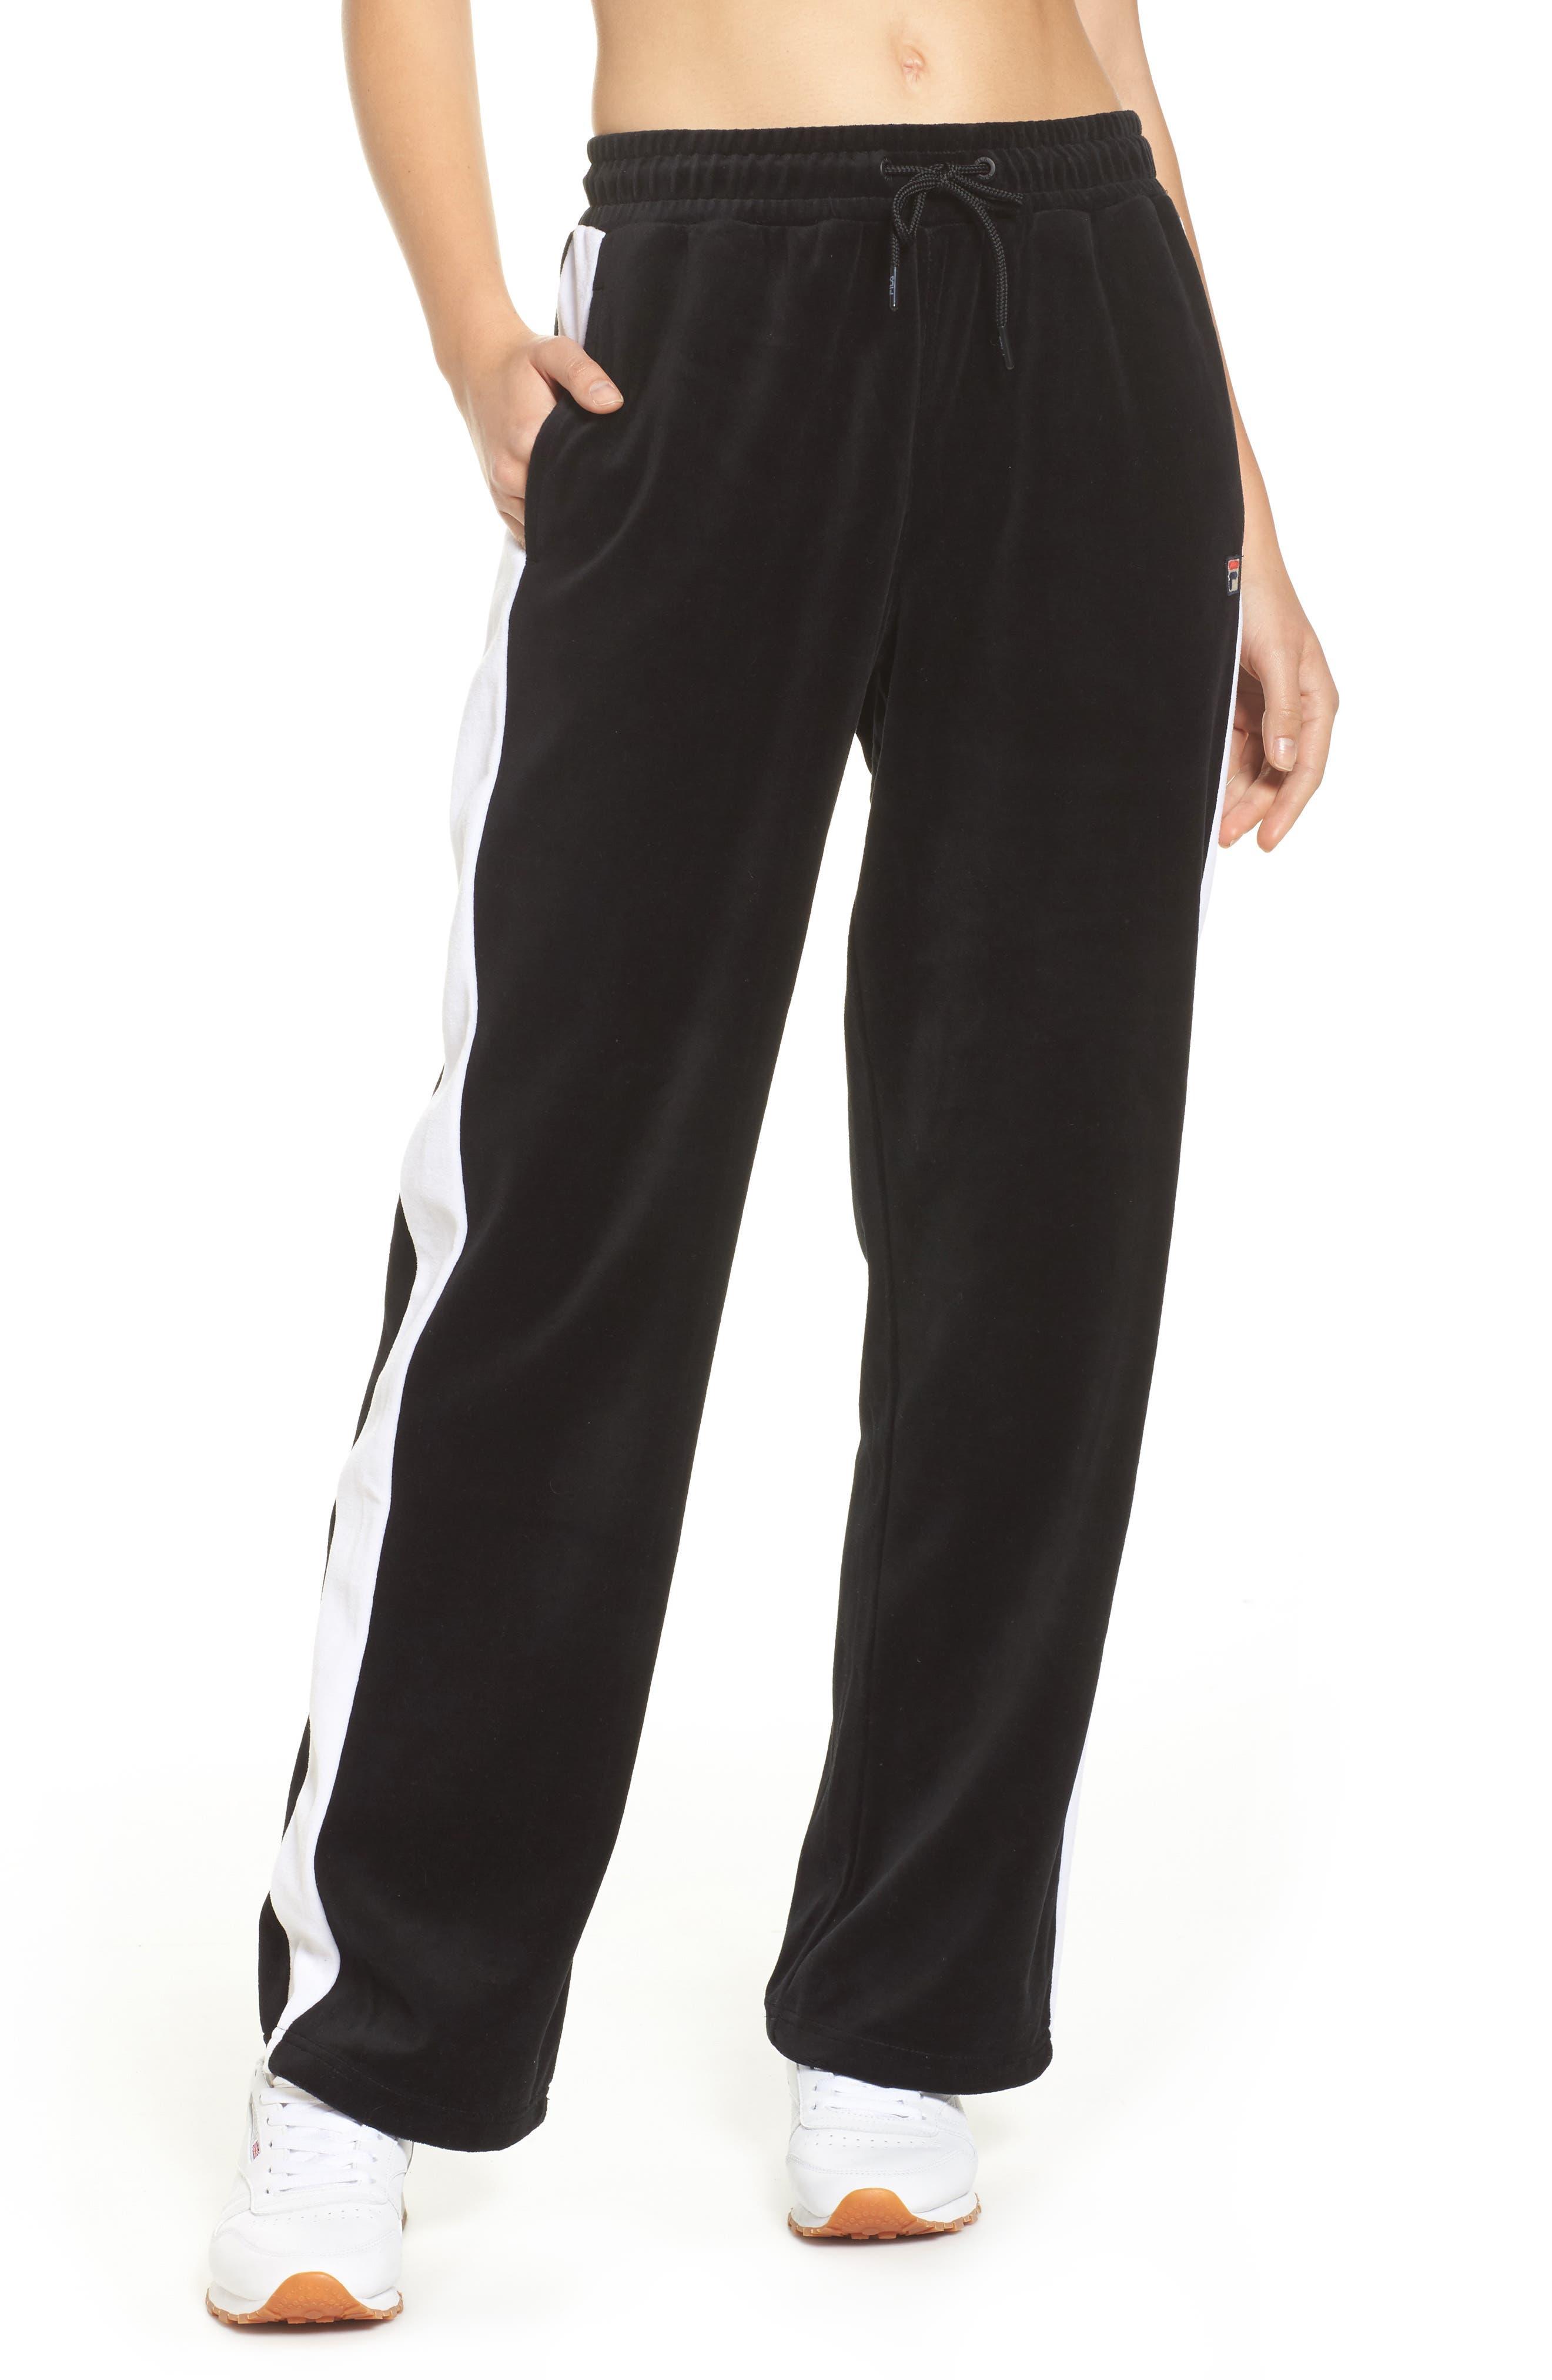 Bonnie Velour Track Pants,                             Main thumbnail 1, color,                             Black/ White